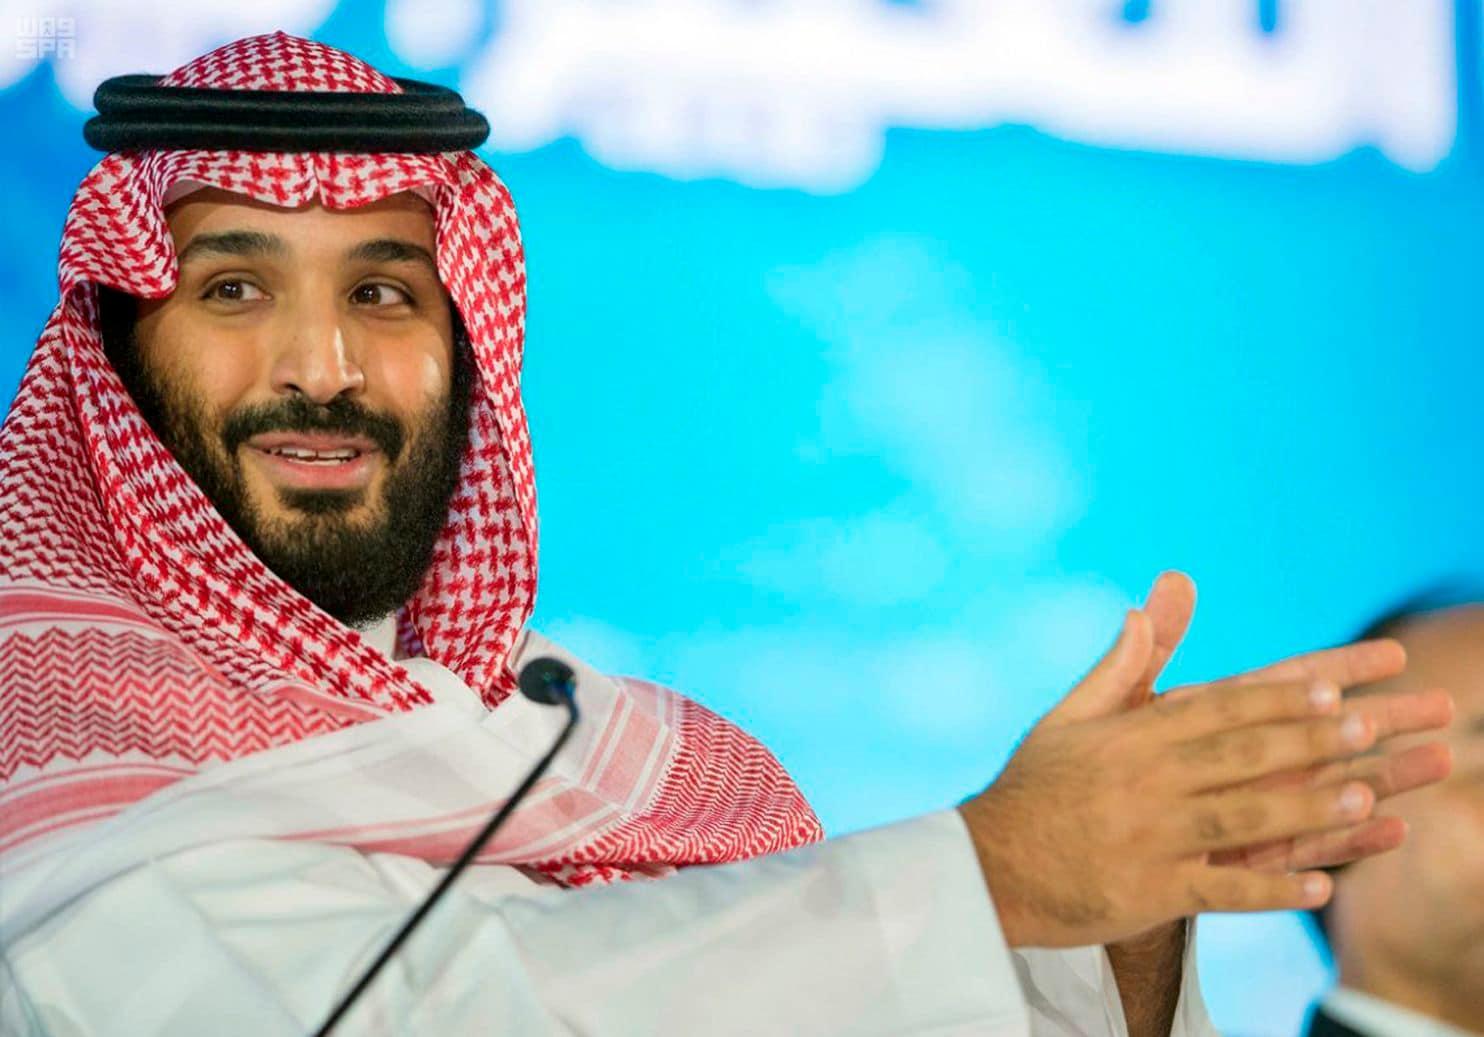 Saudi Arabia's intolerance weakens its Islamic leadership